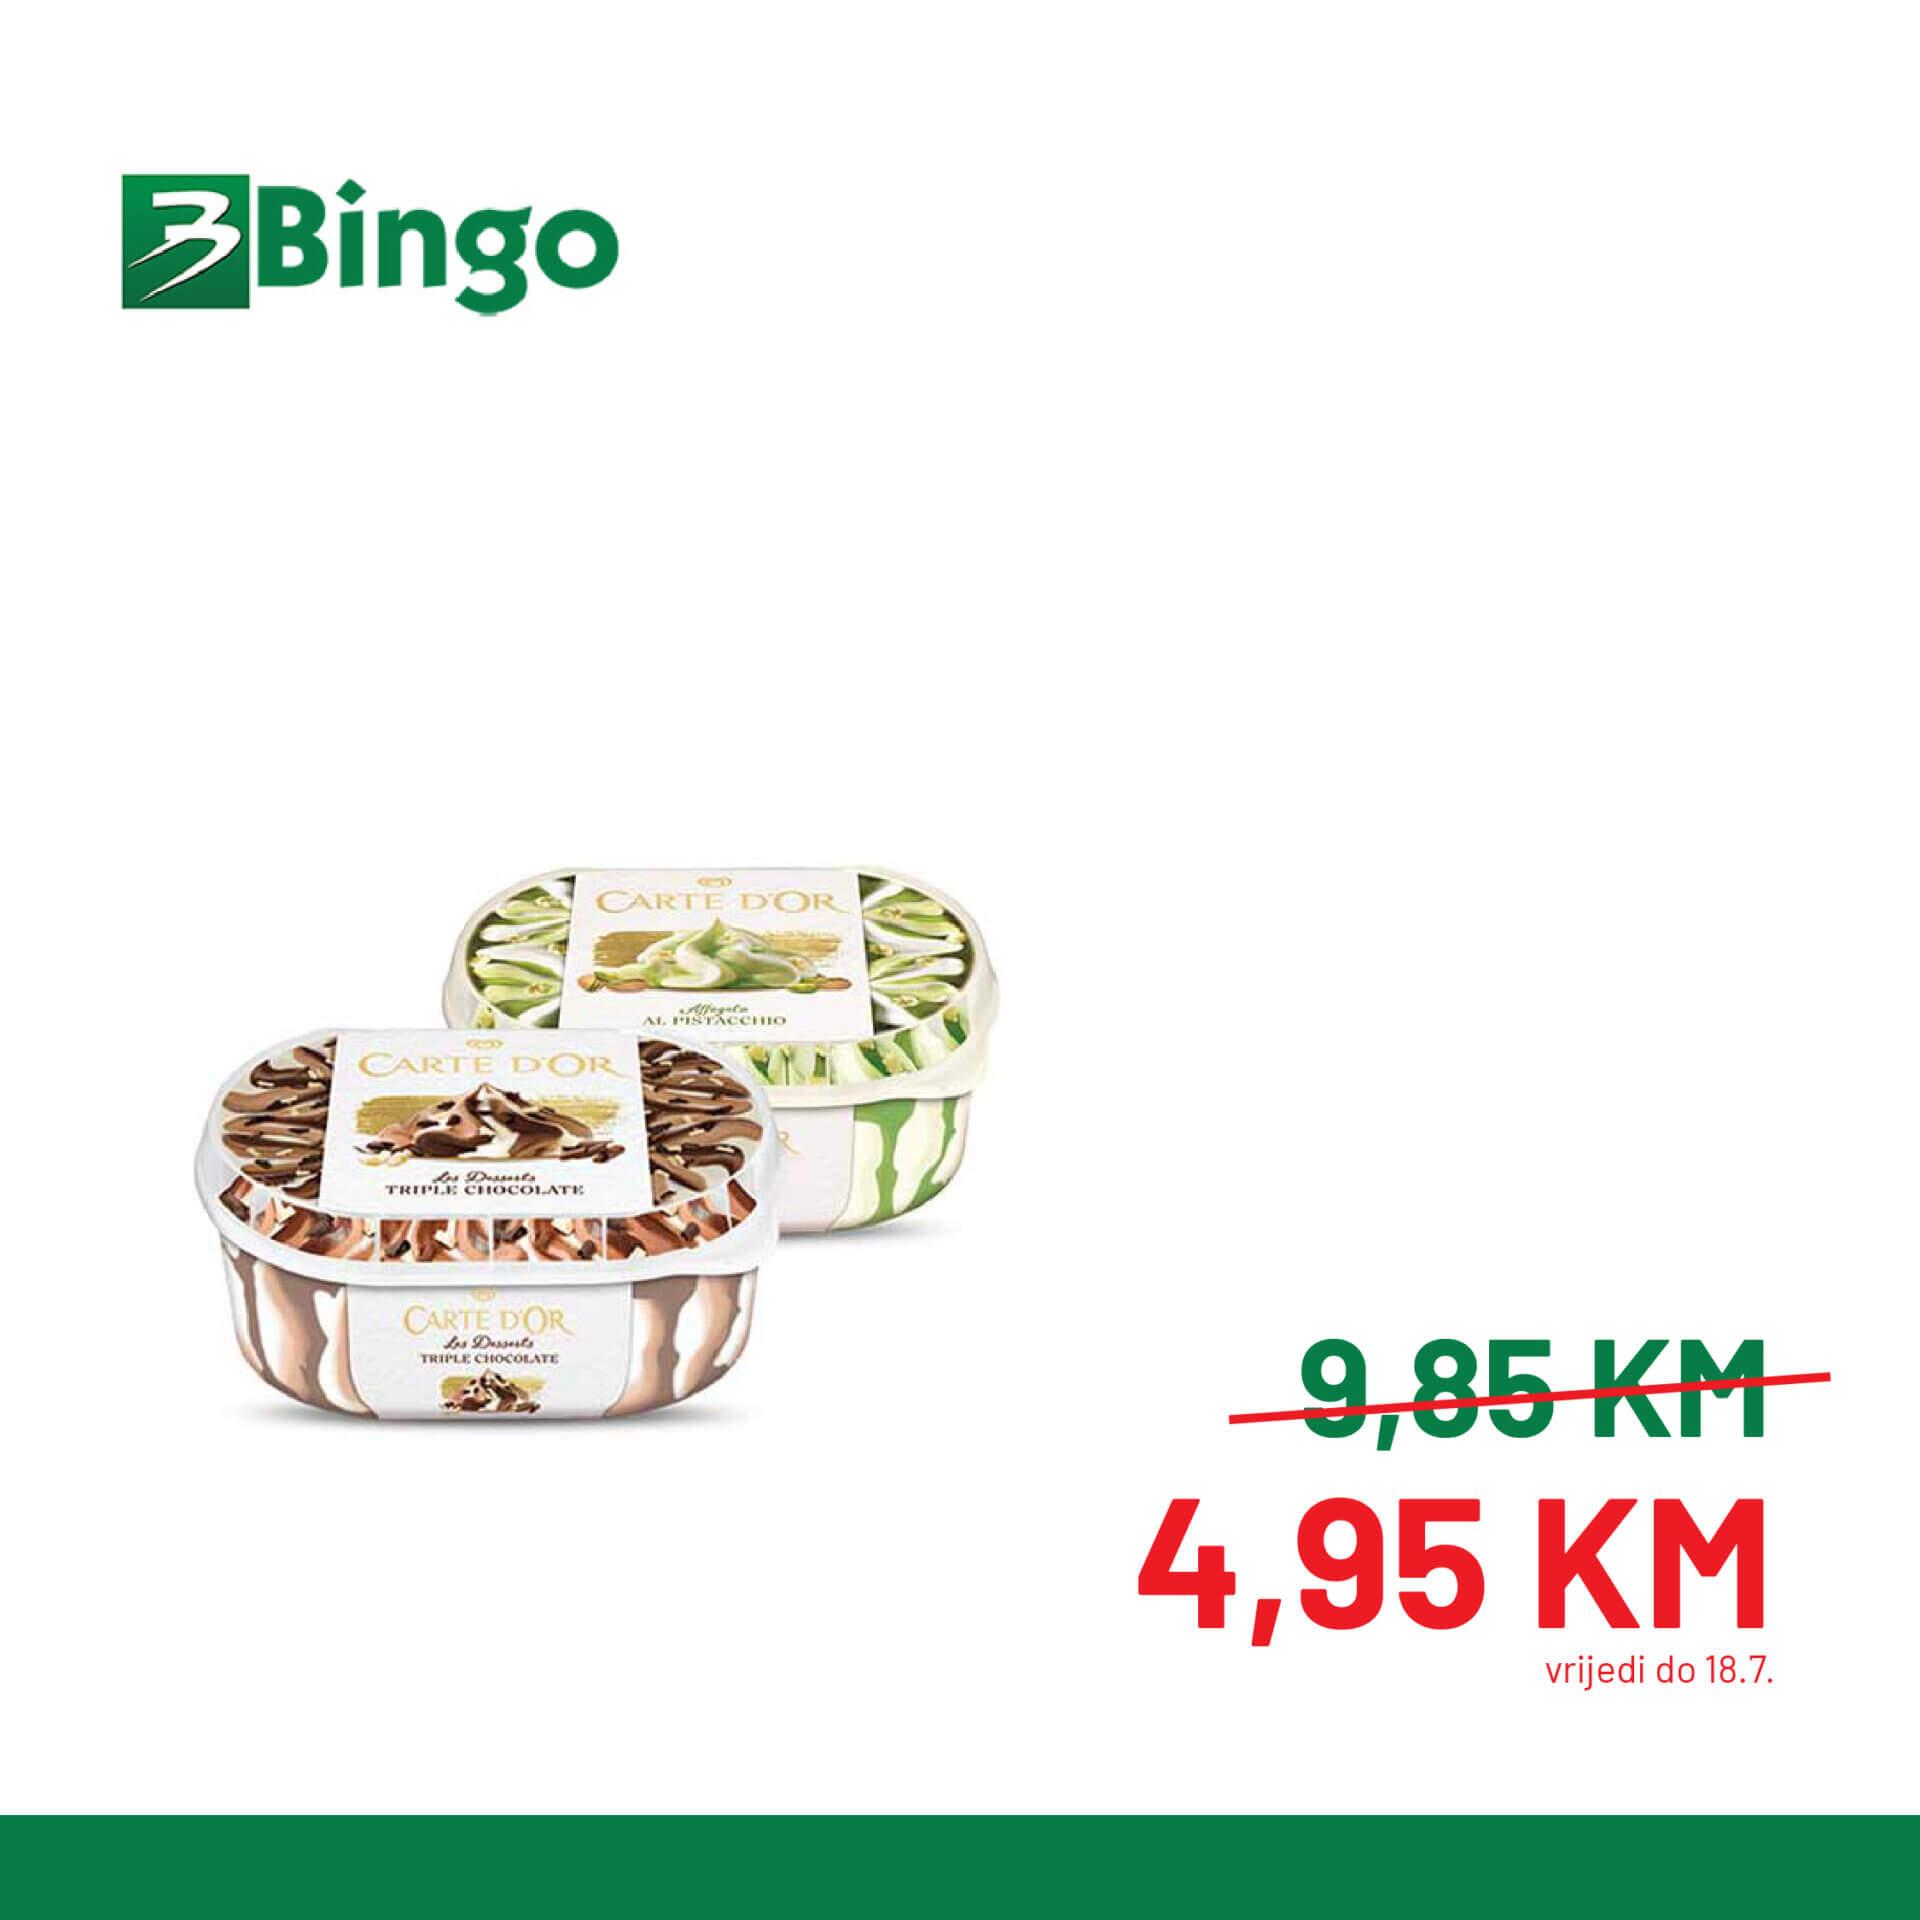 BINGO Katalog Super BINGO Ponude JUL 2021 10.7.2021. 18.7 1 1